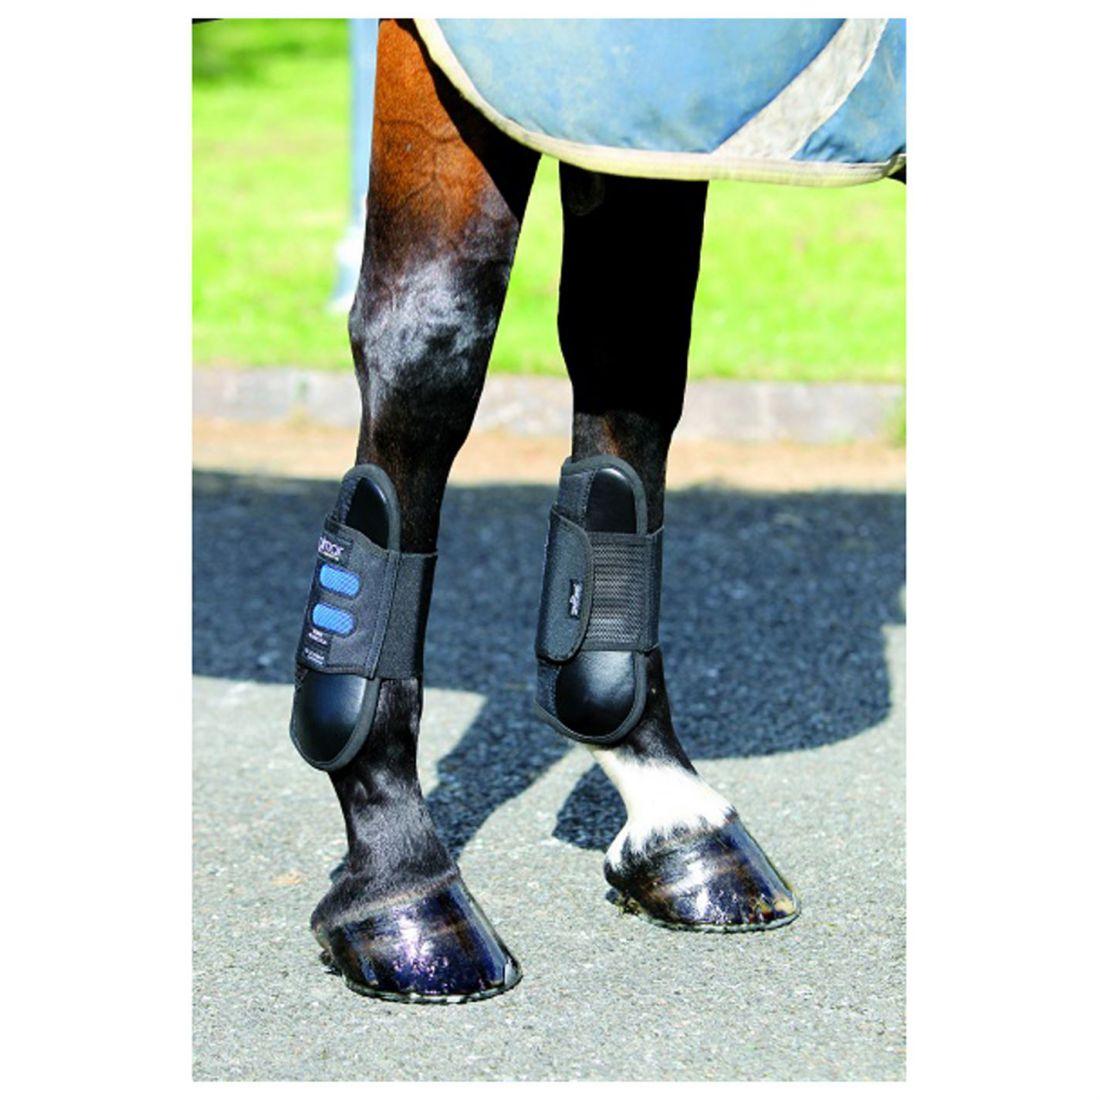 Dalmar Unisex SJ Open Front Tendon Boot Horse Legwear Lightweight Polycarbonate